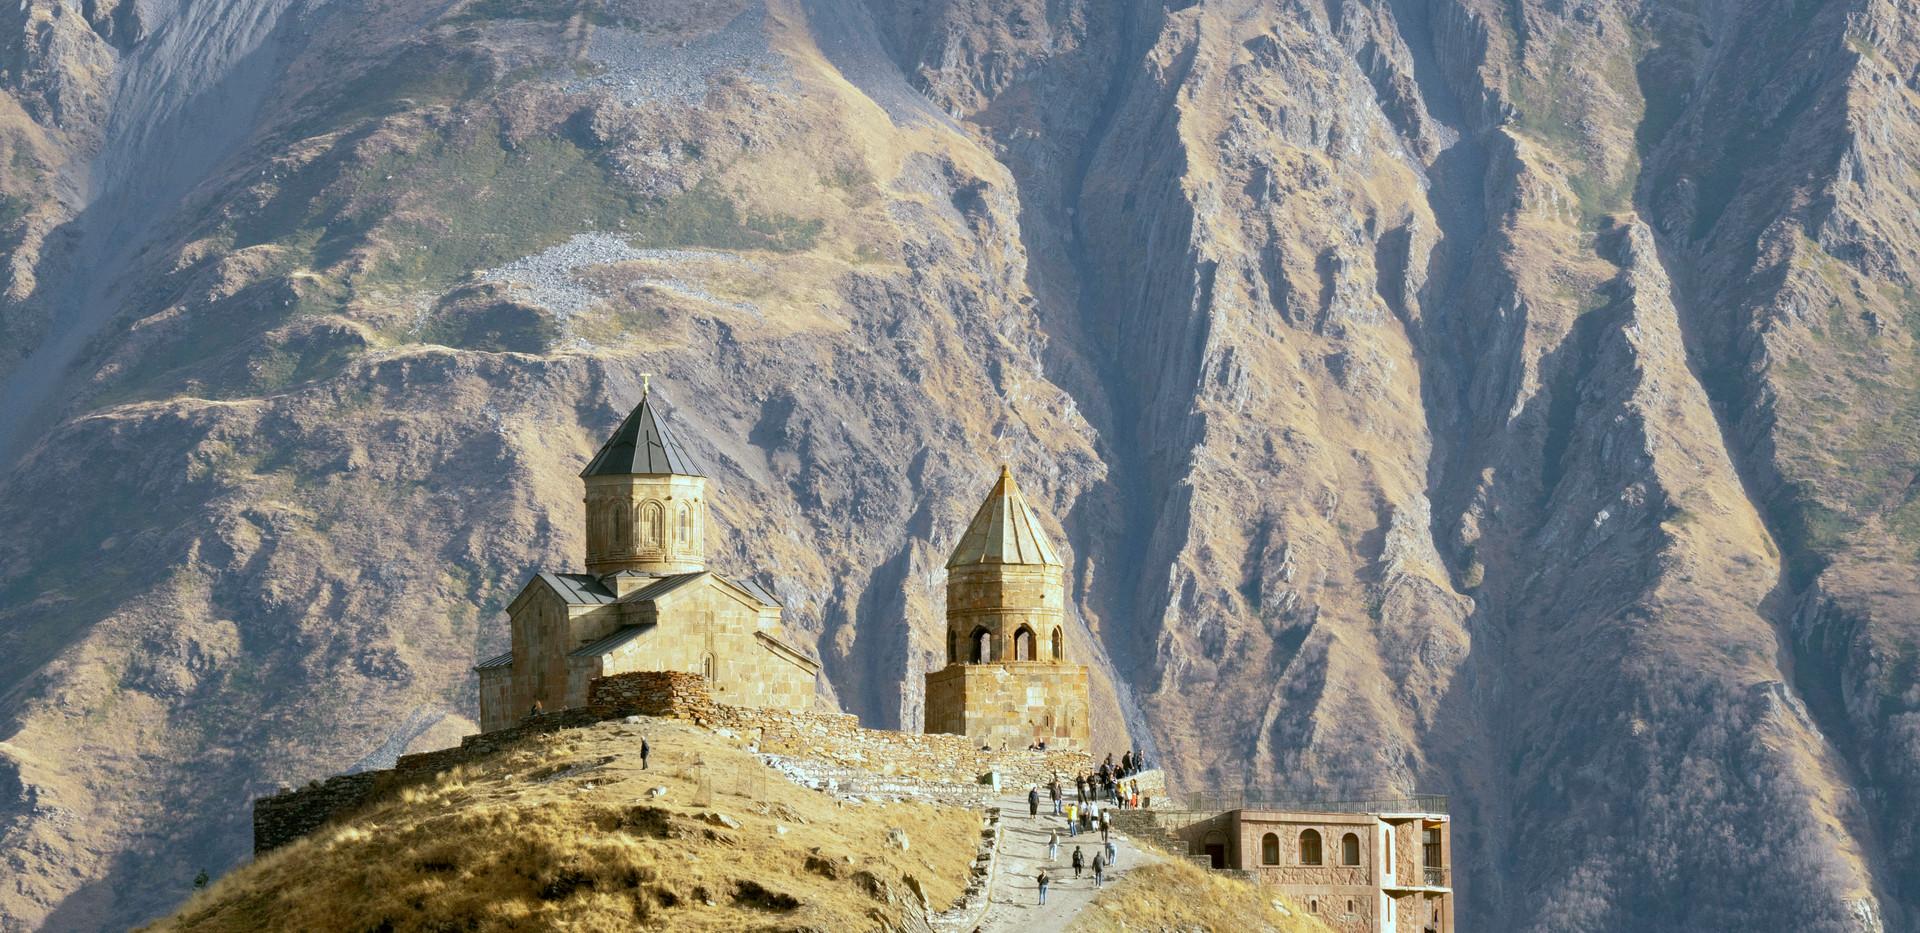 Dreifaltigkeitskirche Tsminda Sameba/Kasbegi/Großer Kaukasus - millionenfach fotografiert